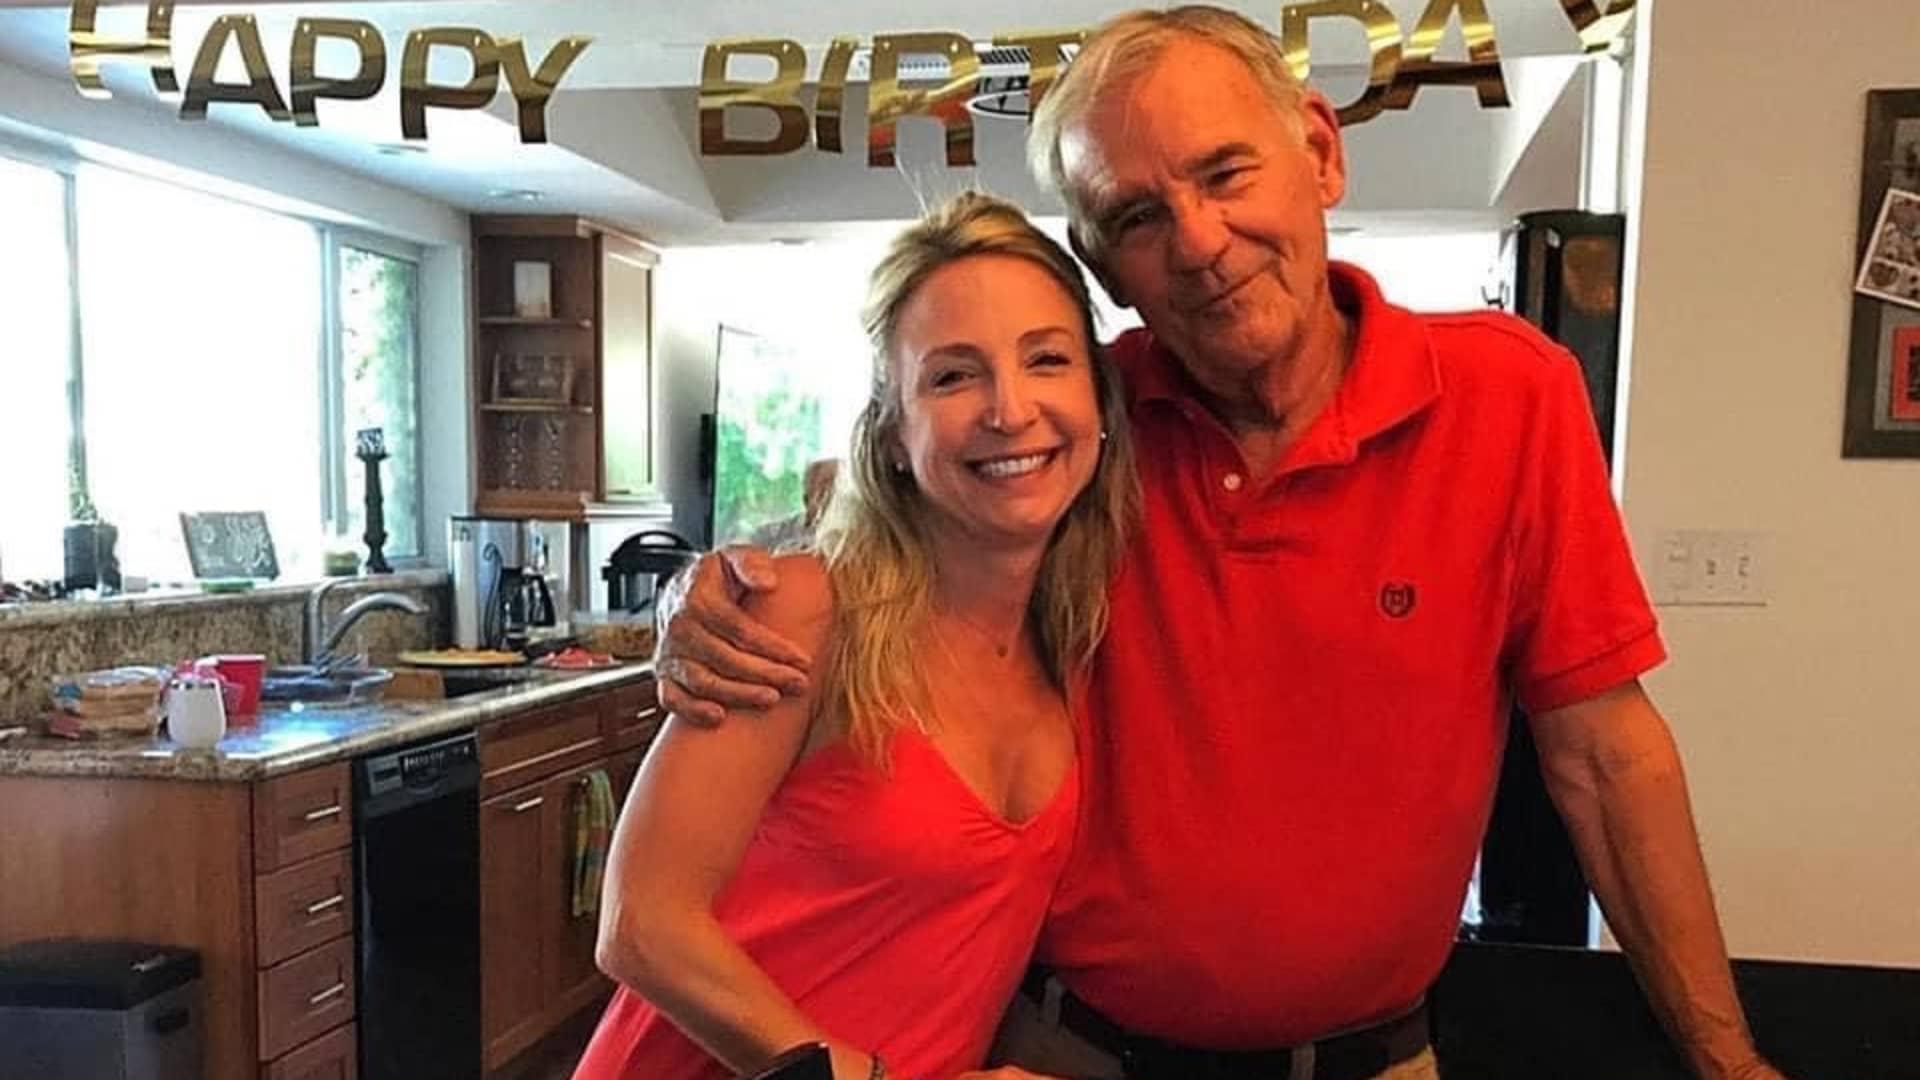 Tara Krebbs and her father, Charles Krebbs